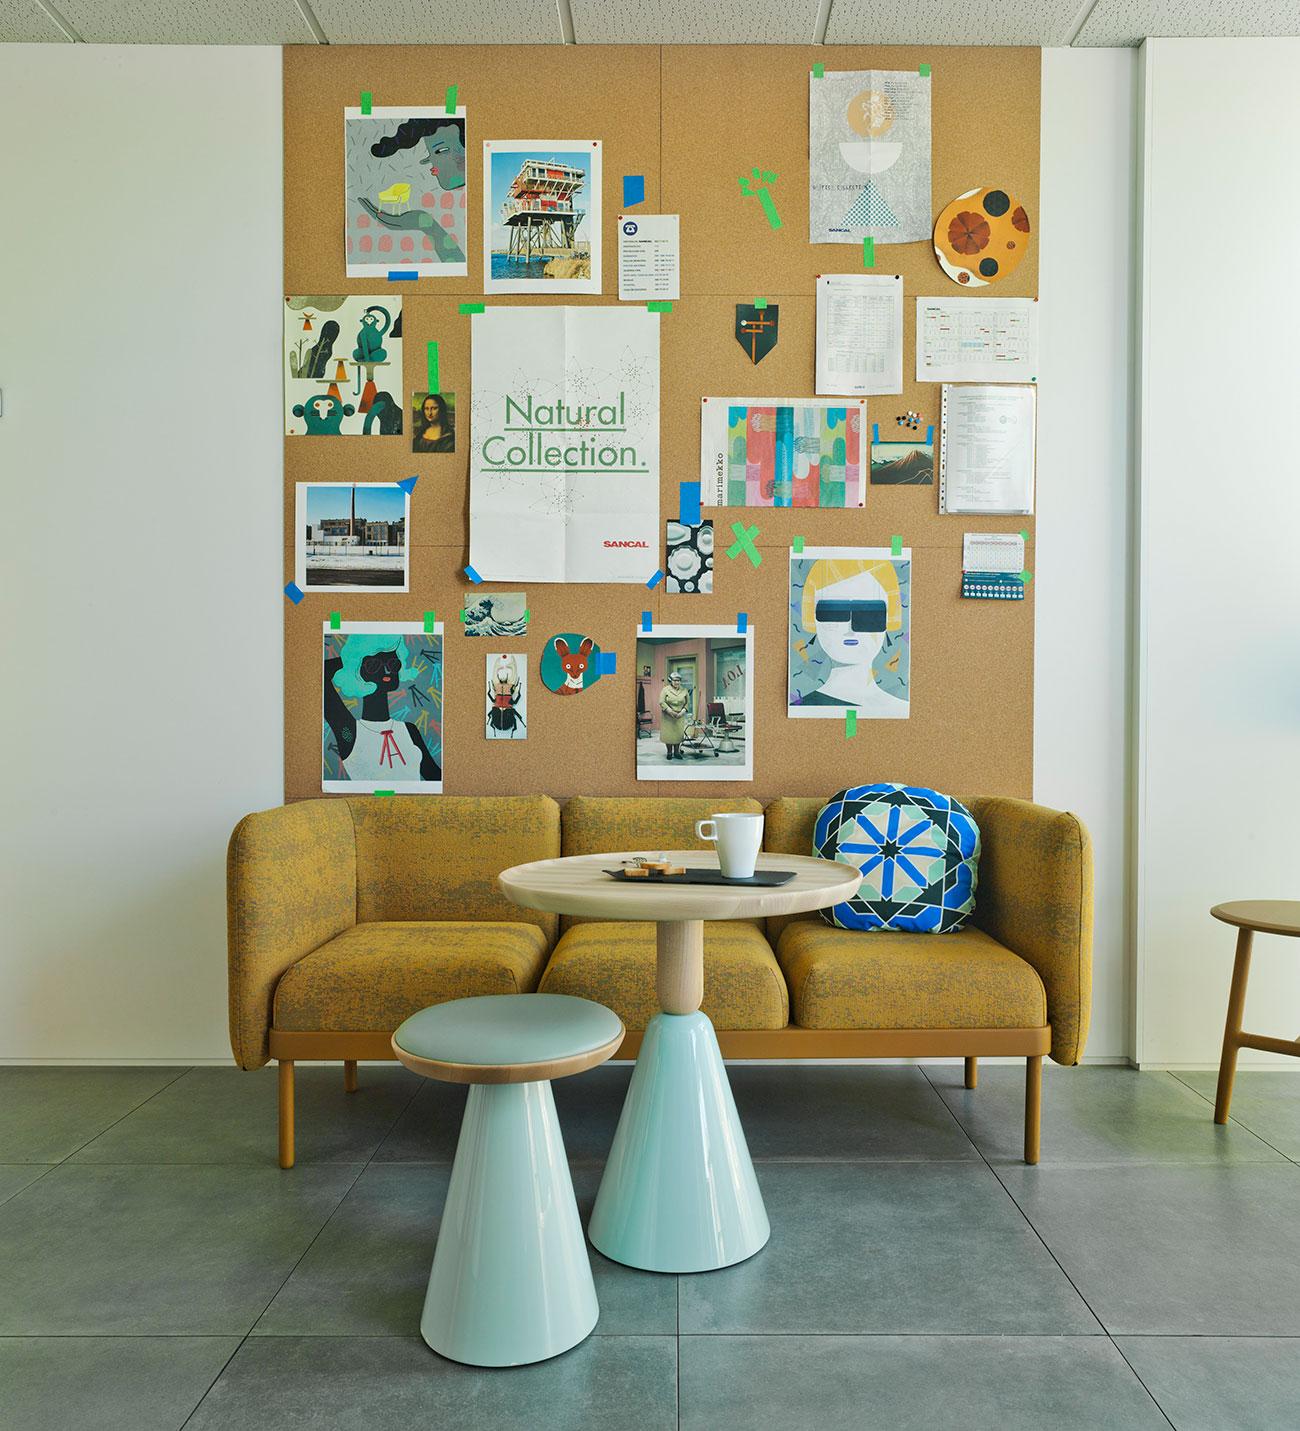 Sancal cultivates its new office space! — Sancal